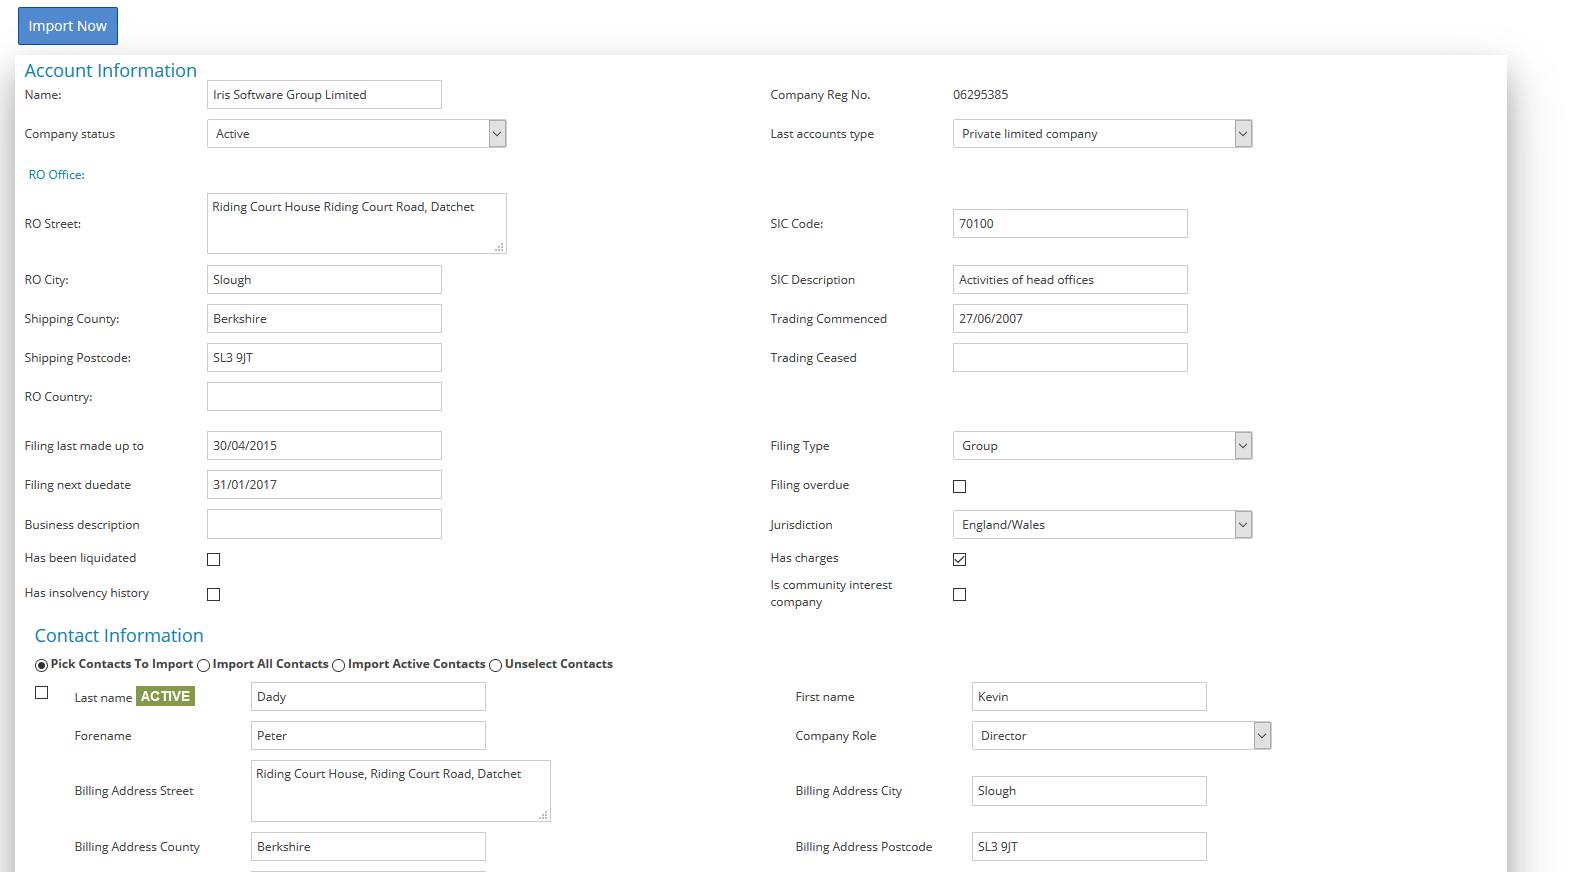 Company Registration details